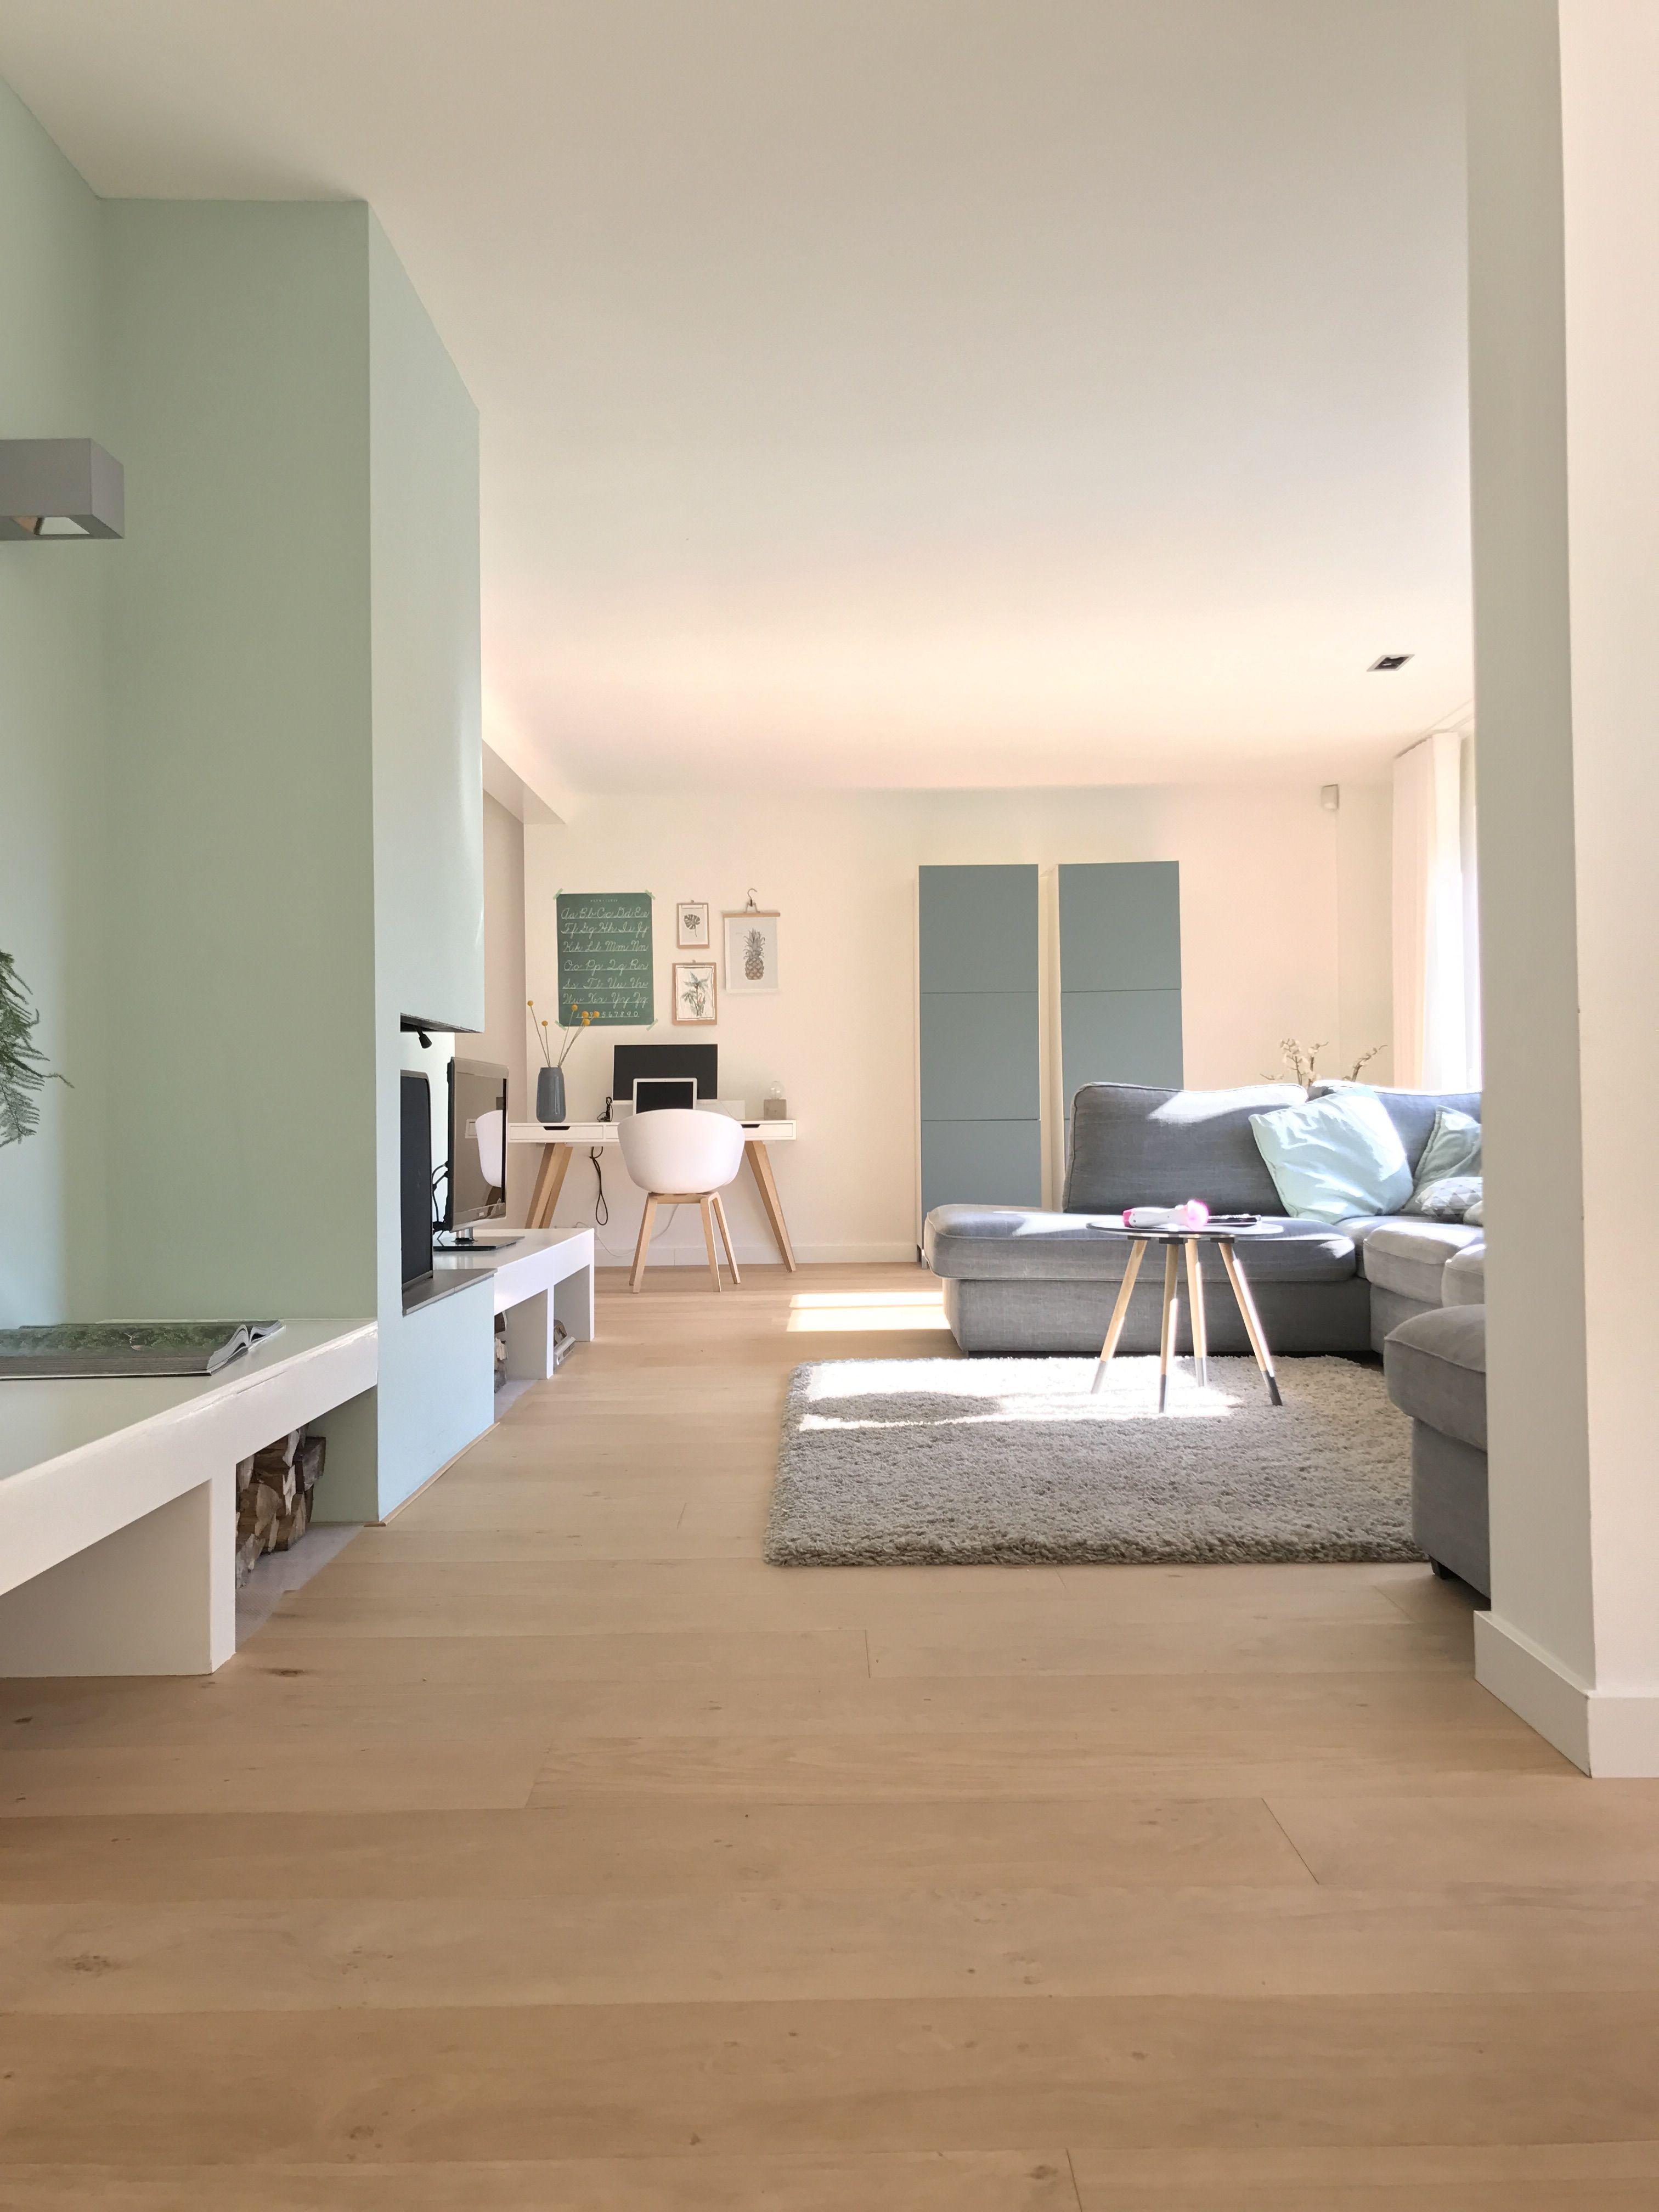 Moderne woonkamer met een mooie licht eiken parketvloer